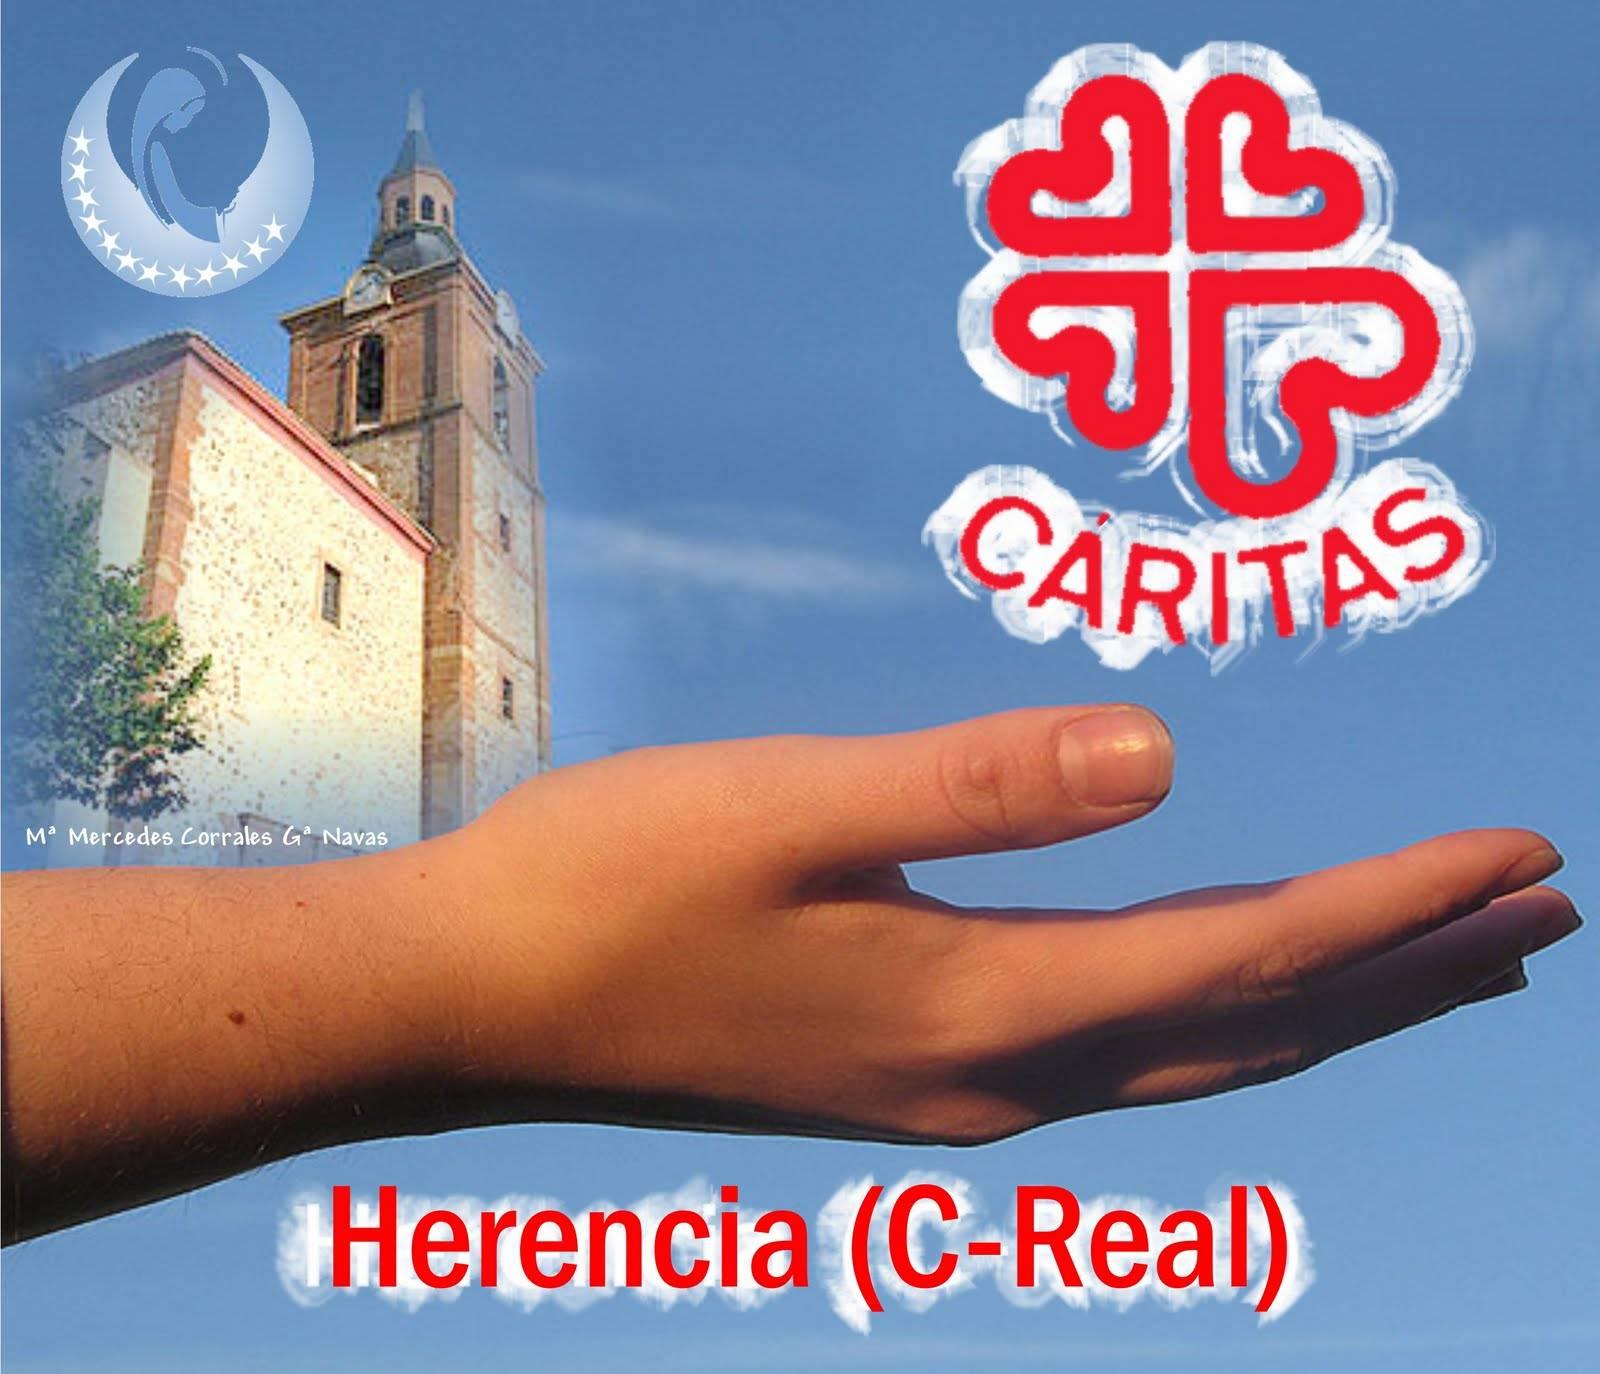 Cáritas Herencia. Imagen de Mercedes Corrales